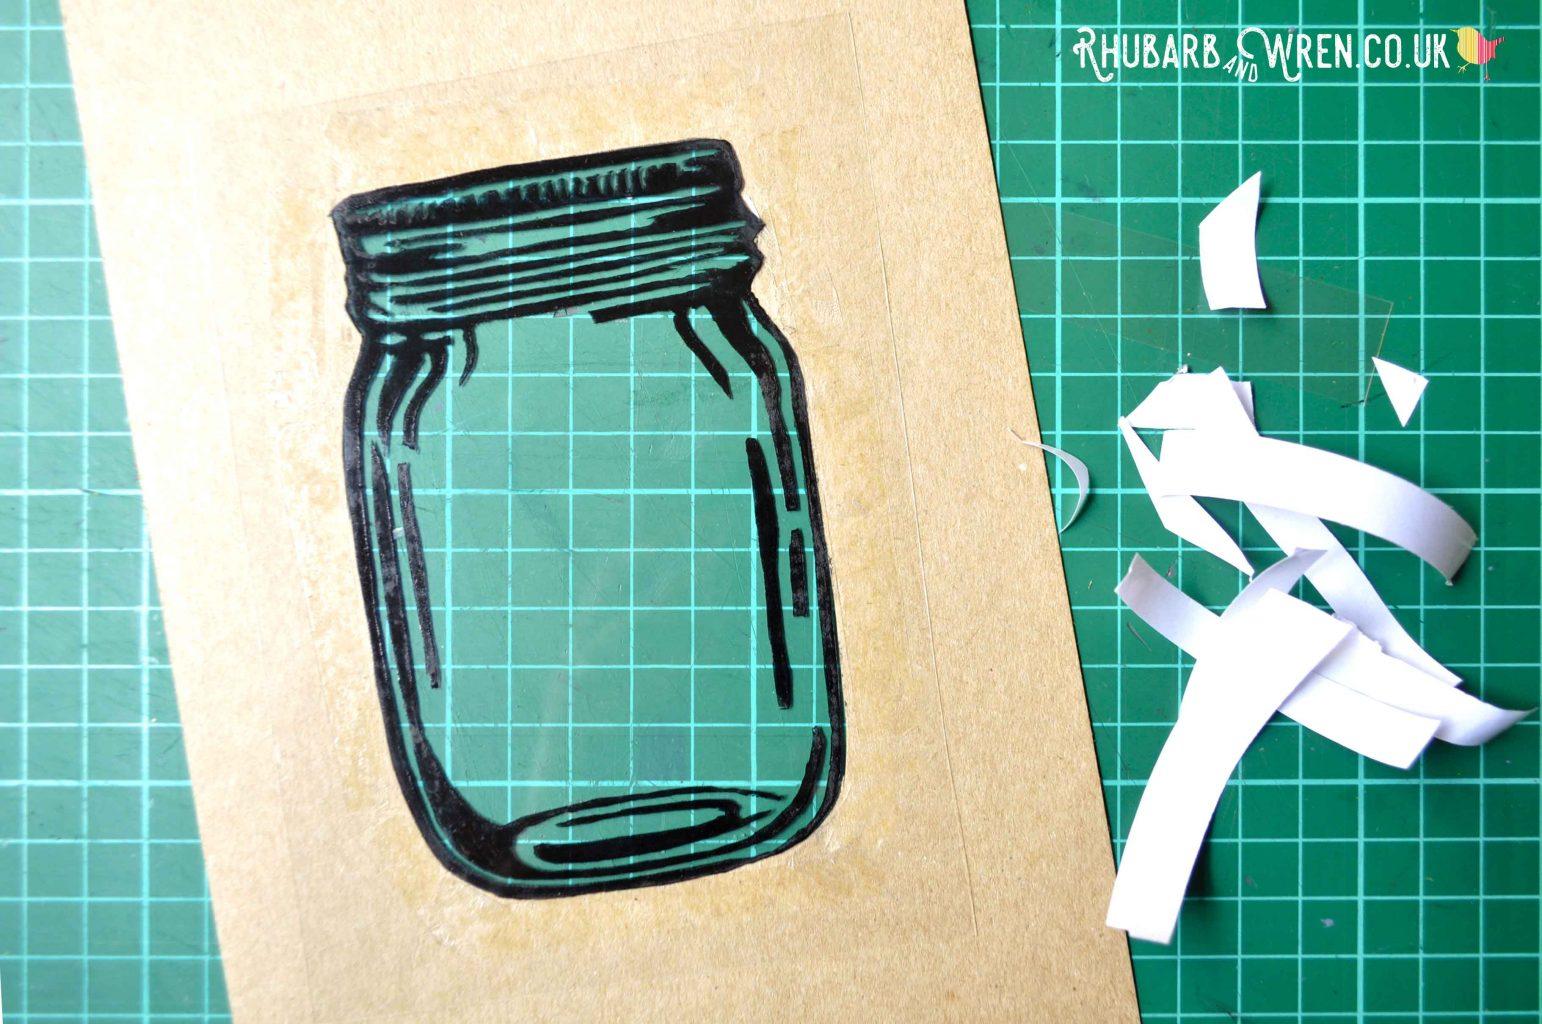 DIY Mason jar shaker card front image